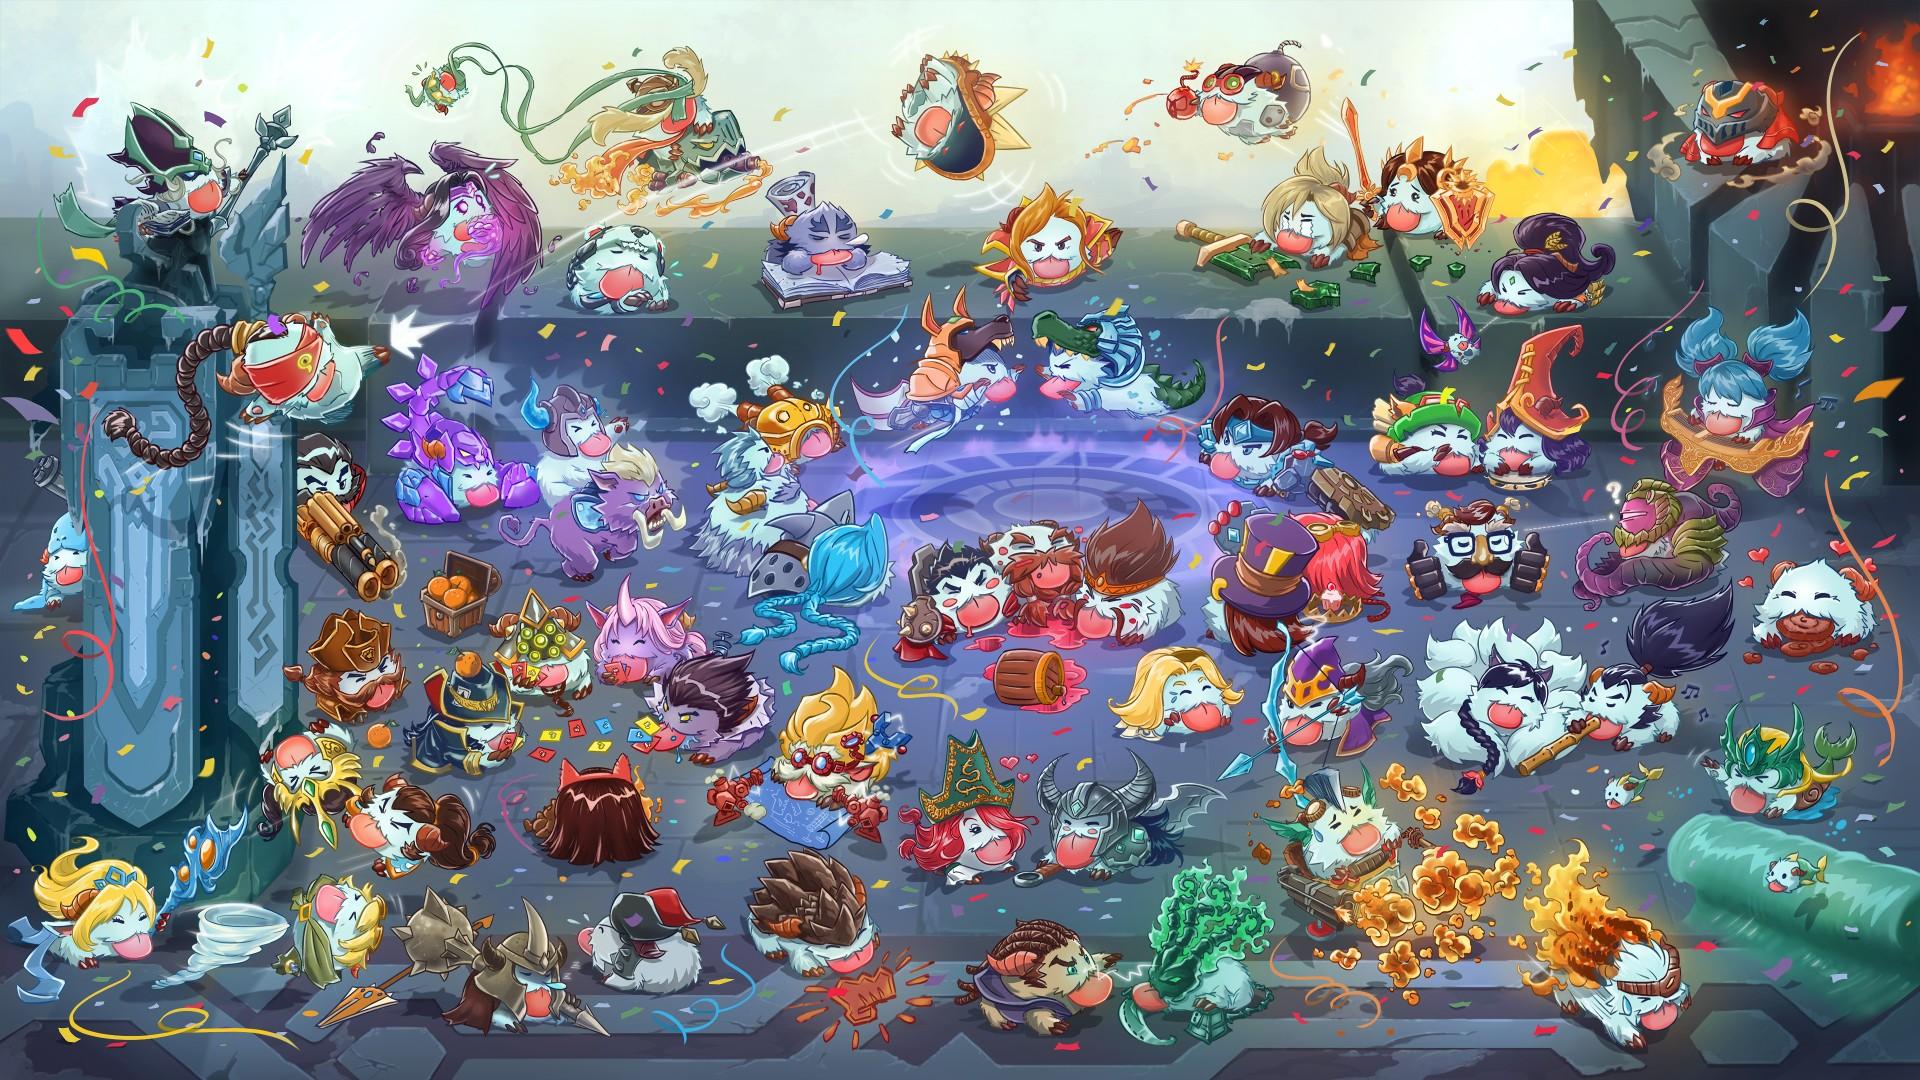 Wallpaper : illustration, anime, League of Legends, Thresh, Leona League of  Legends, Lulu League of Legends, Morgana League of Legends, Twisted Fate,  grave, ...